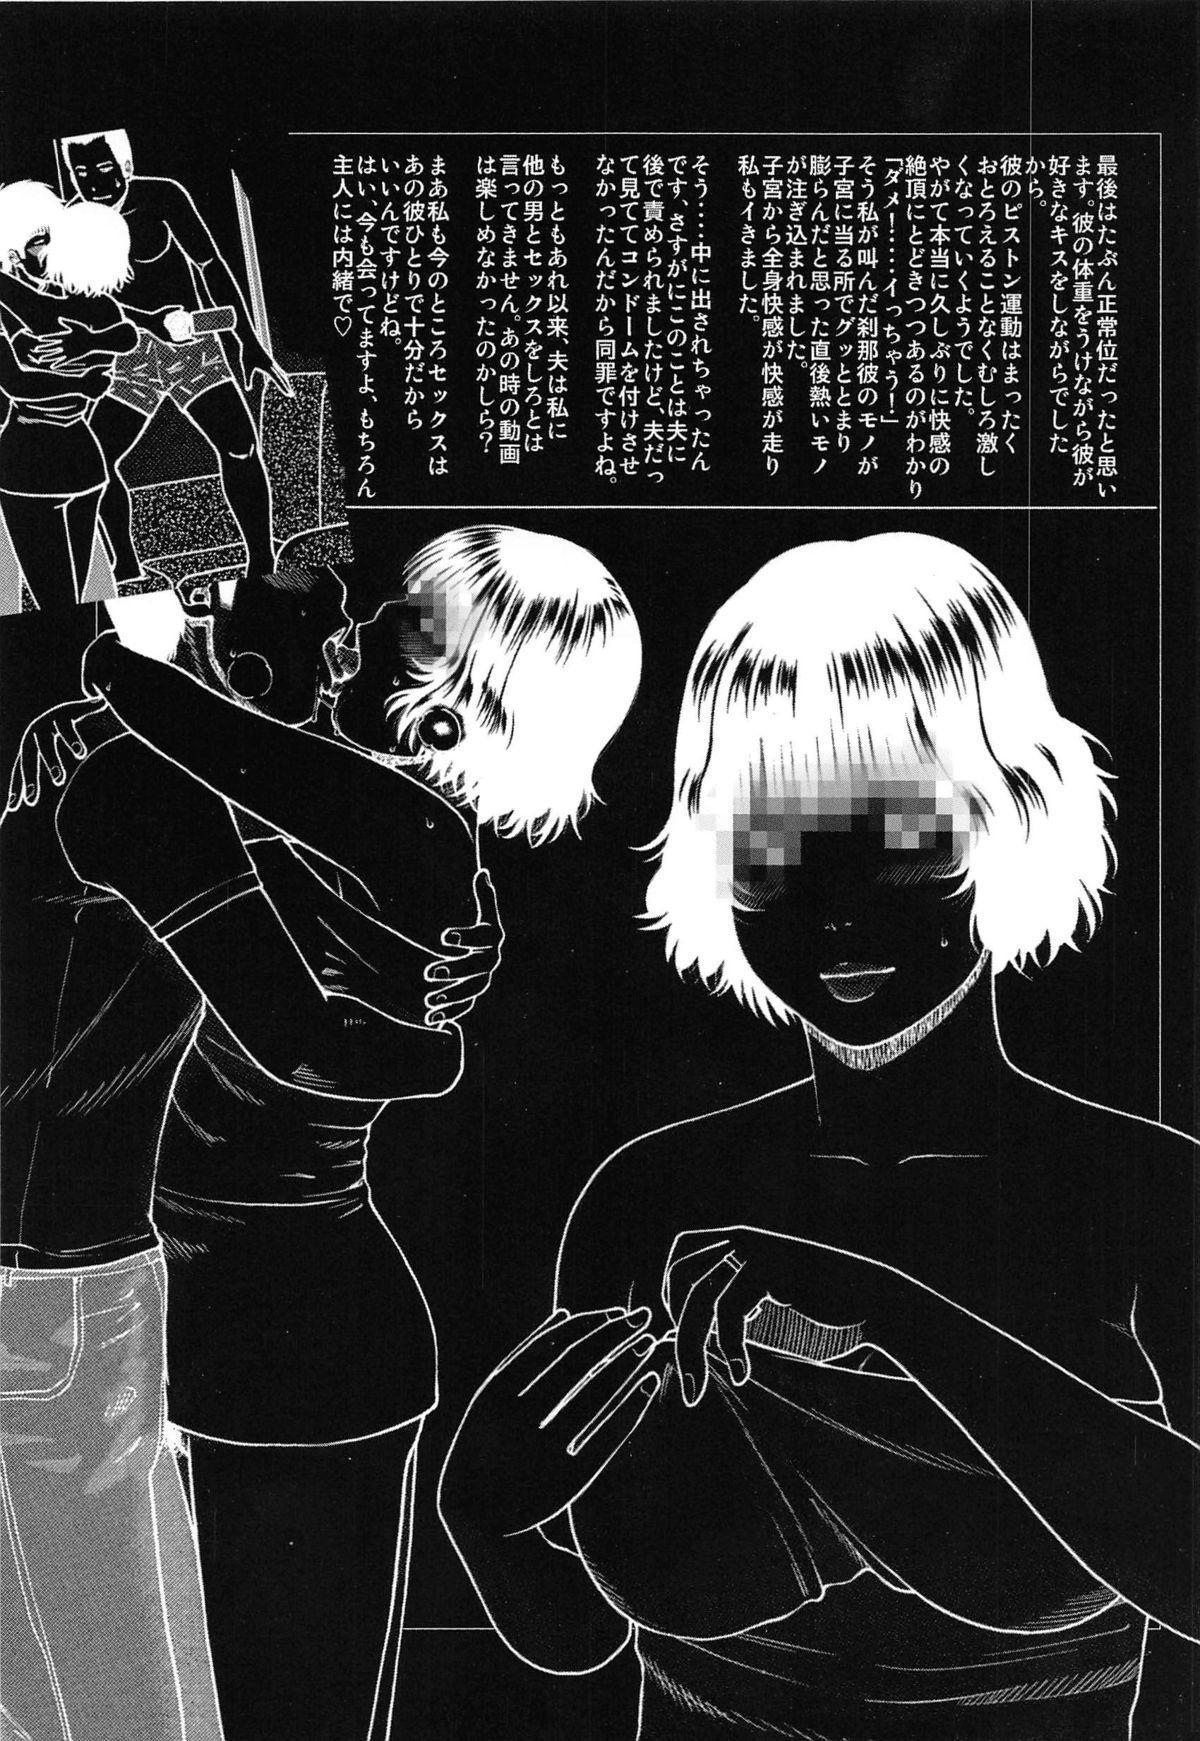 [Kuroki Hidehiko] 35 Sai Yarigoro Zuma | 35-Year-Old Ripe Wife [English] {Tadanohito} [Decensored] 7